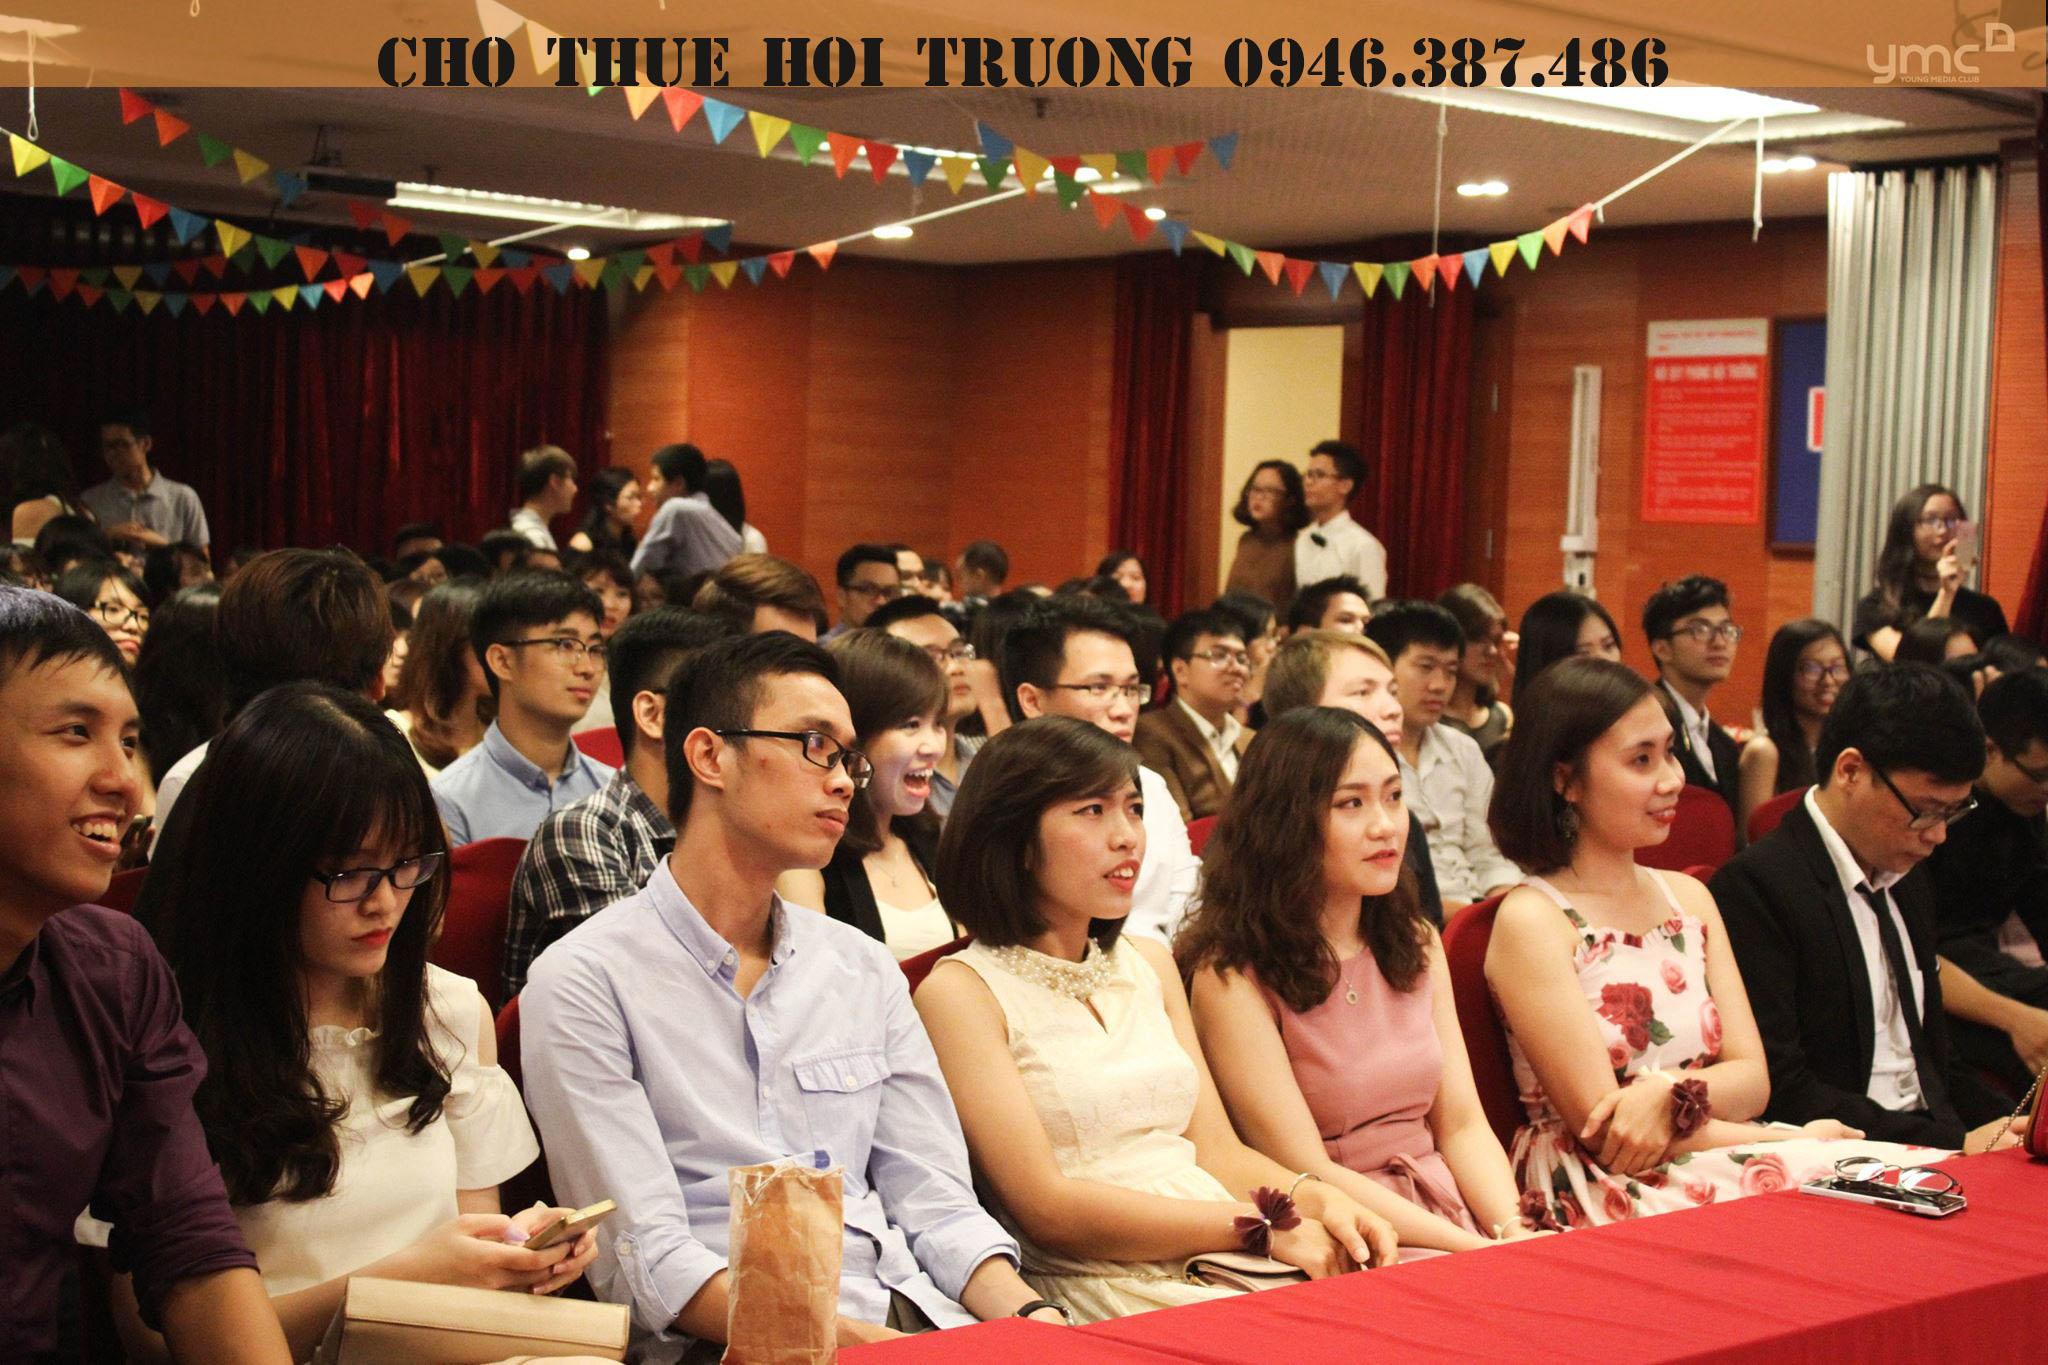 cho-thue-hoi-truong-to-chuc-sinh-nhat-YMC-2